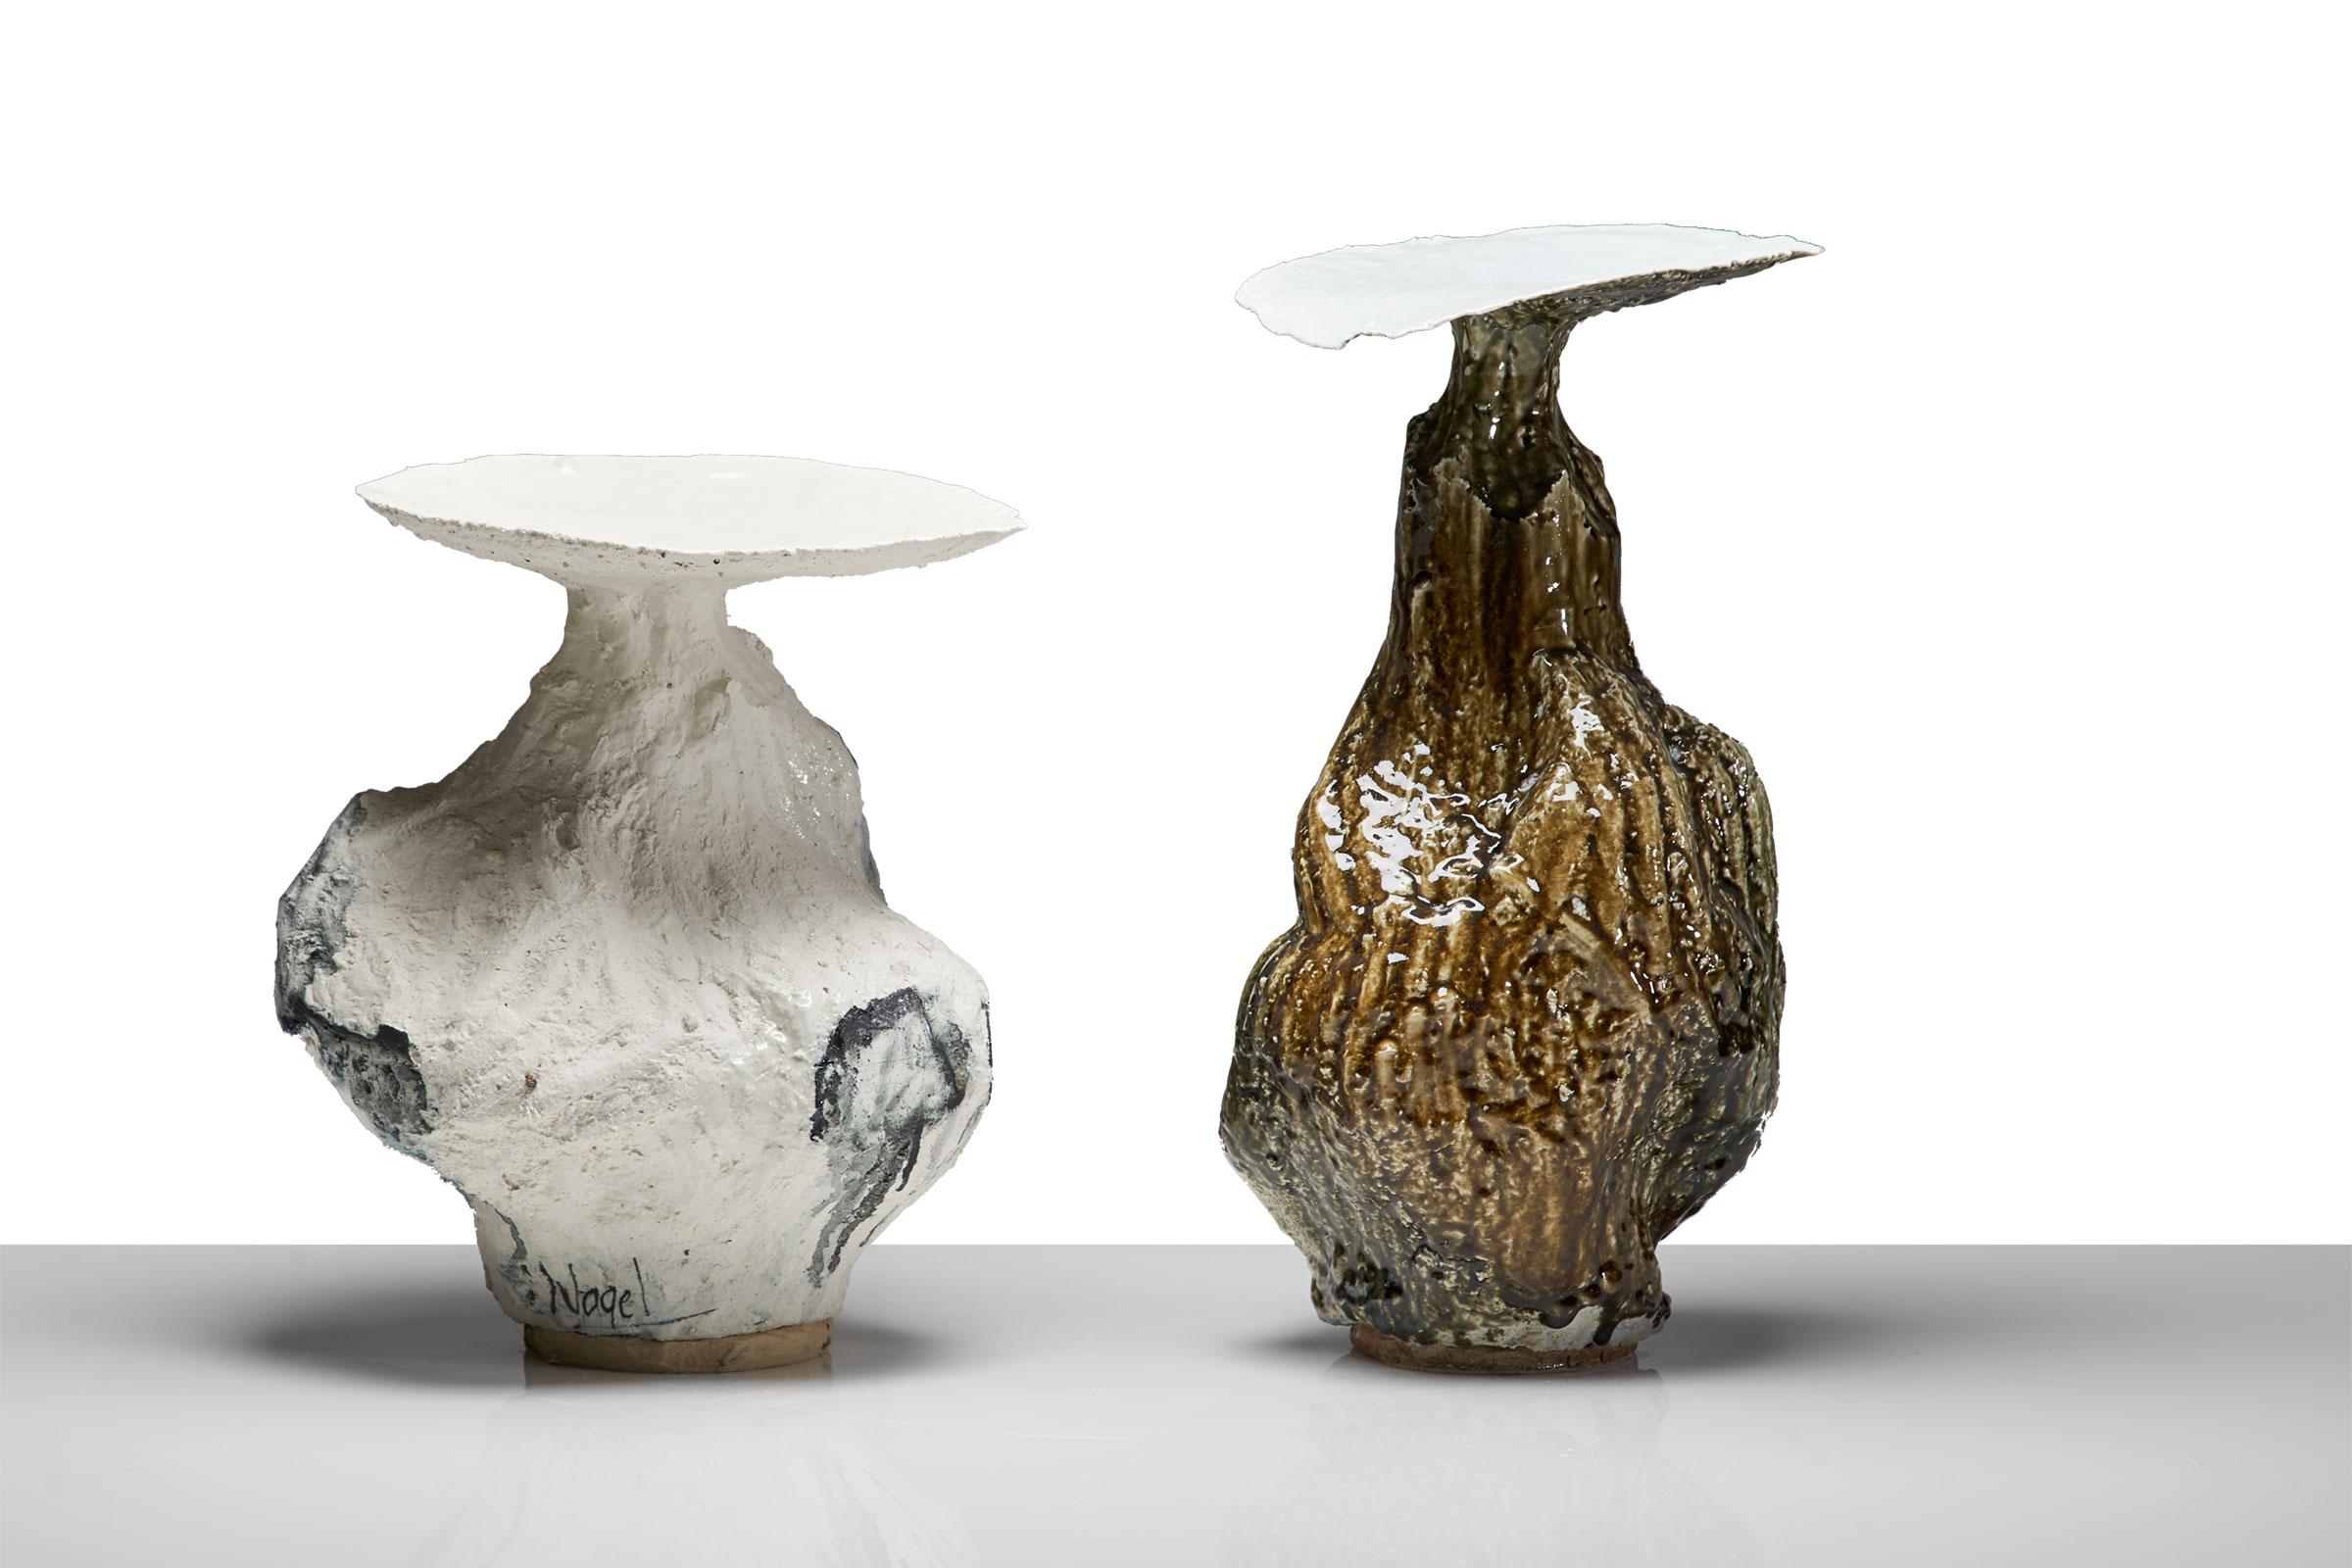 Johannes Nagel – Gefäße, Porzellan – 2003, 45 & 55 cm – galerie metzger ceramic contamporary object art gallery